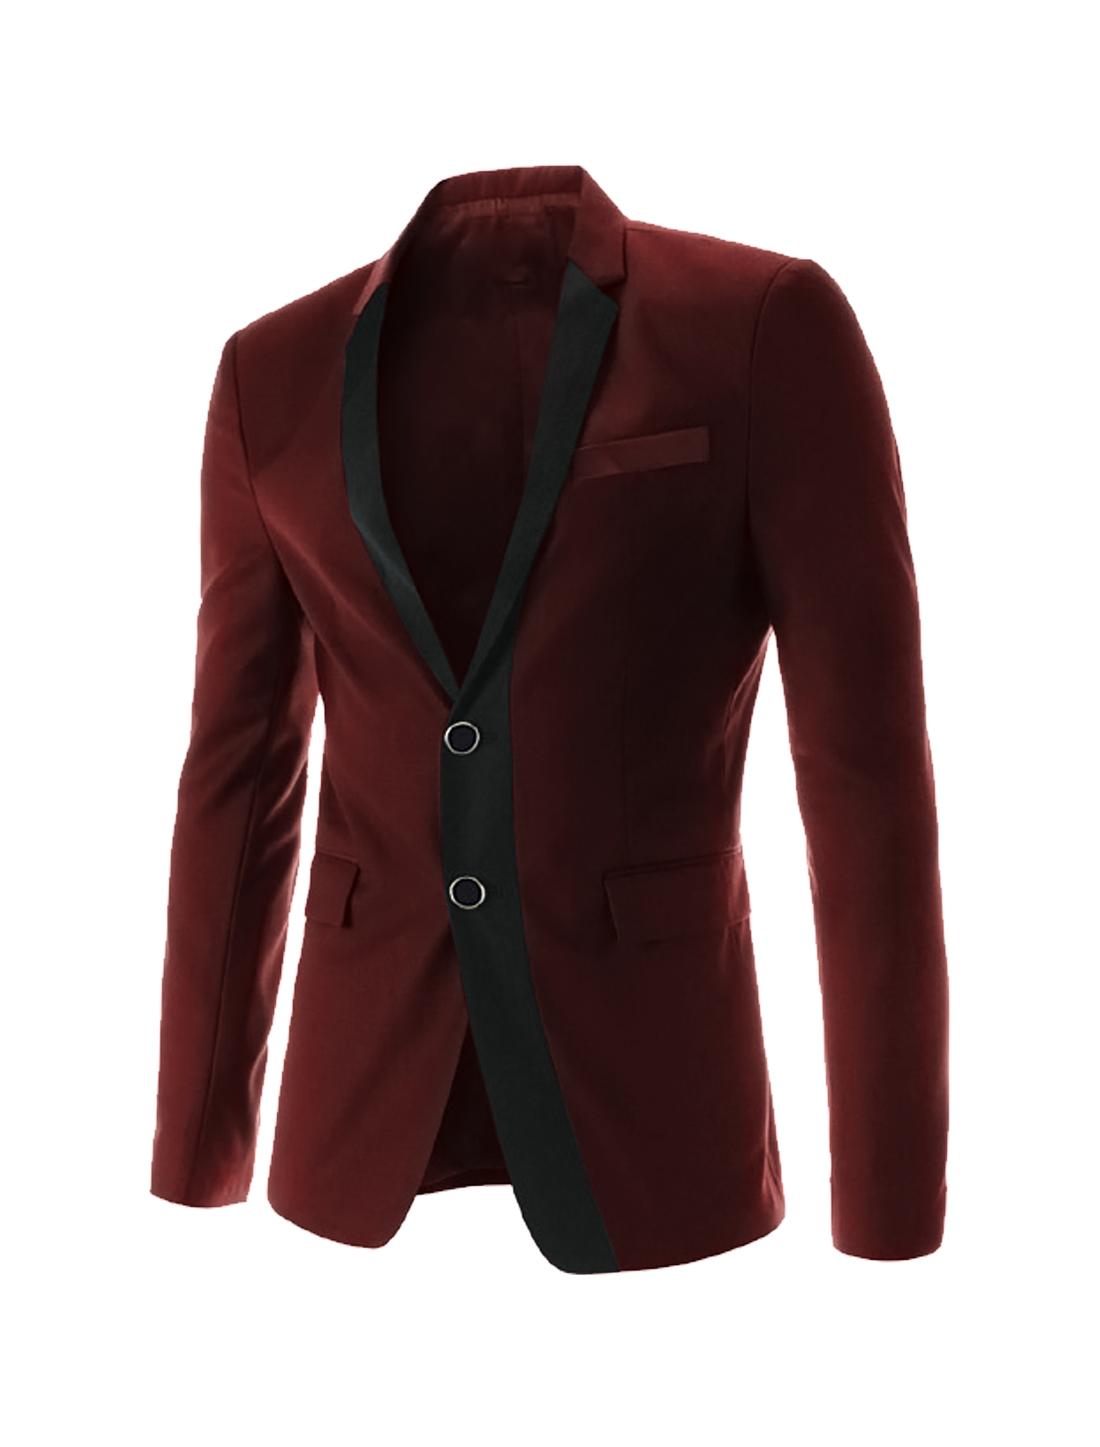 Men Long Sleeve Button Closure Front Pockets Blazer Jacket Burgundy M